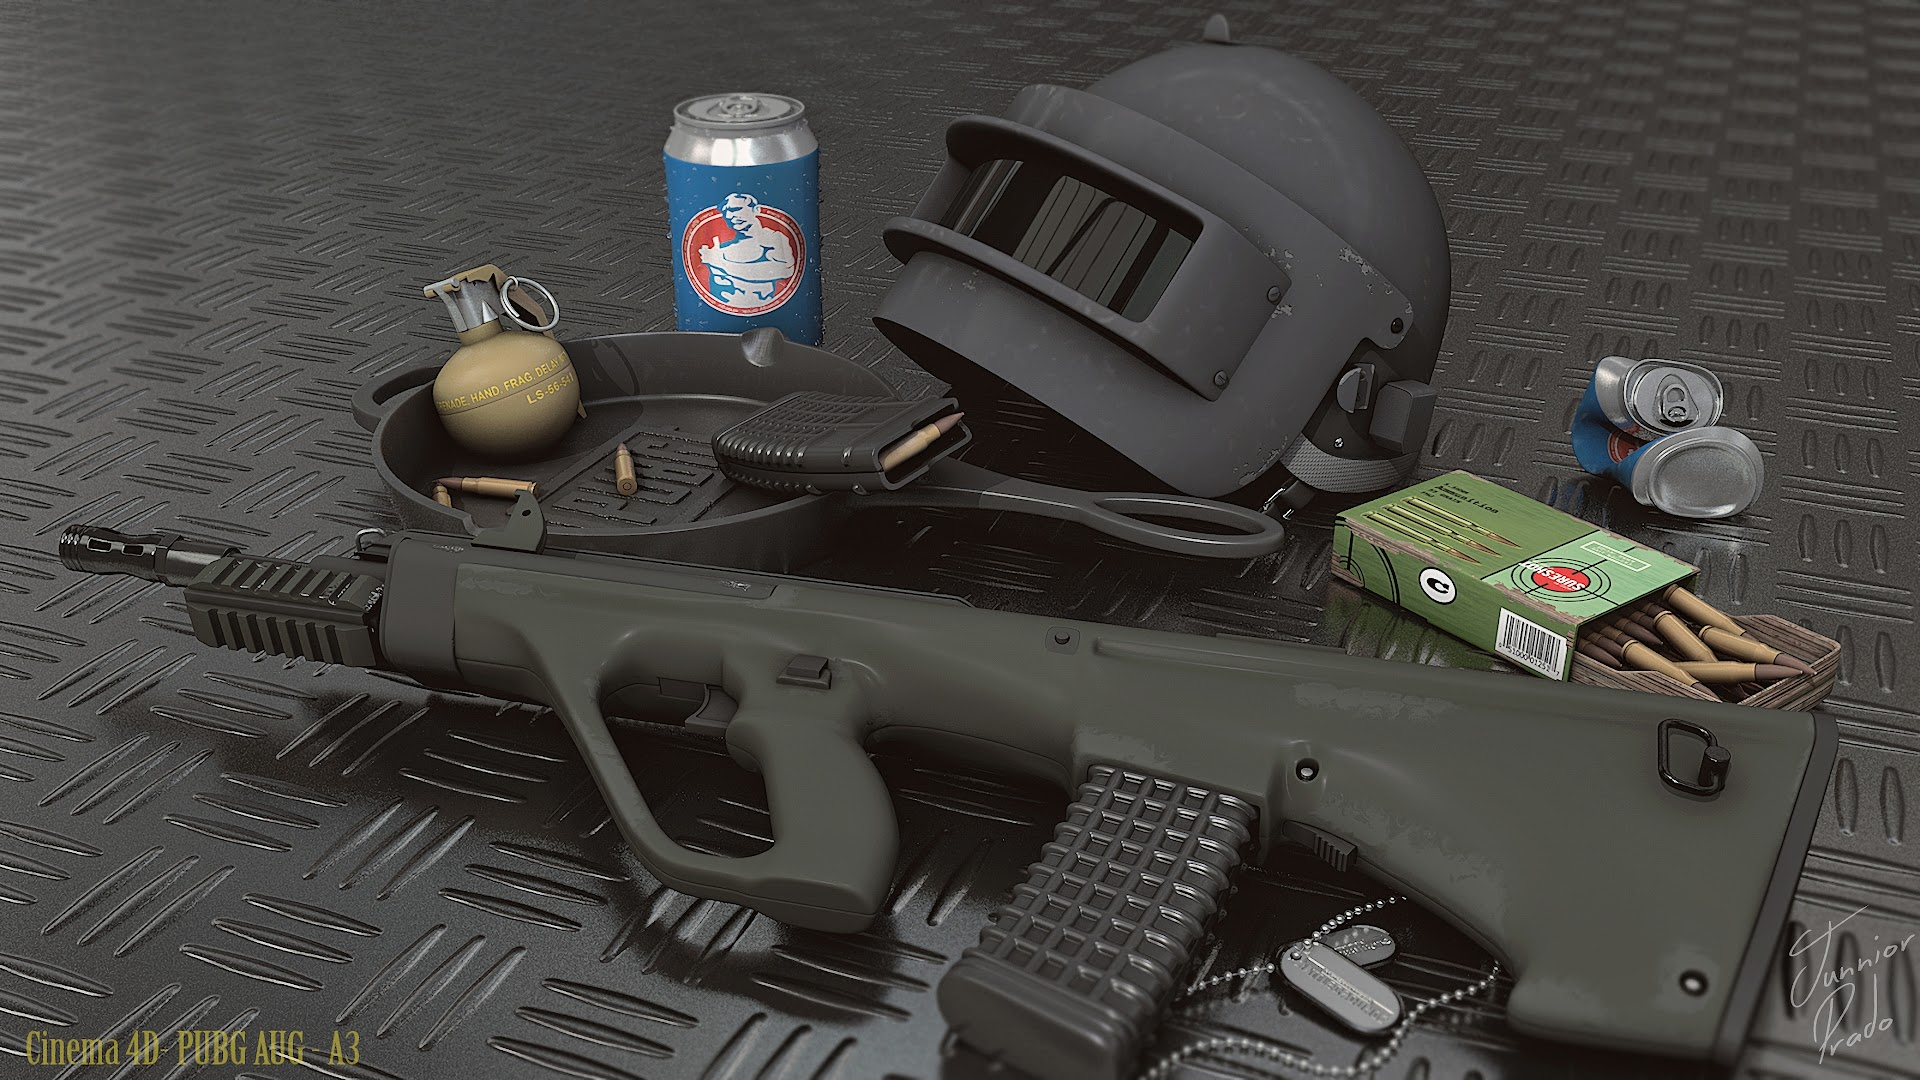 Pubg Weapons Rifle Helmet Playerunknown S Battlegrounds 4k